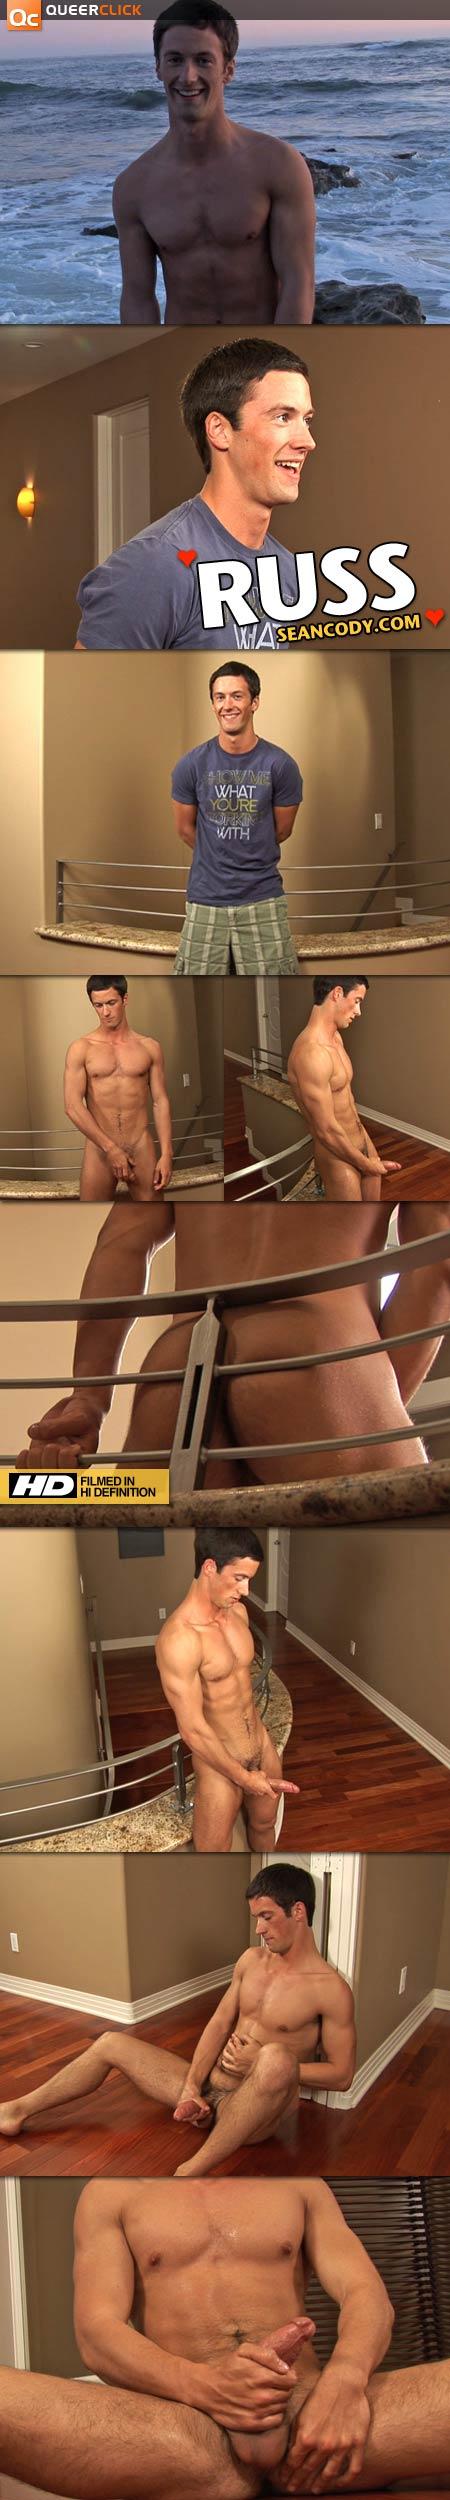 Sean Cody: Russell